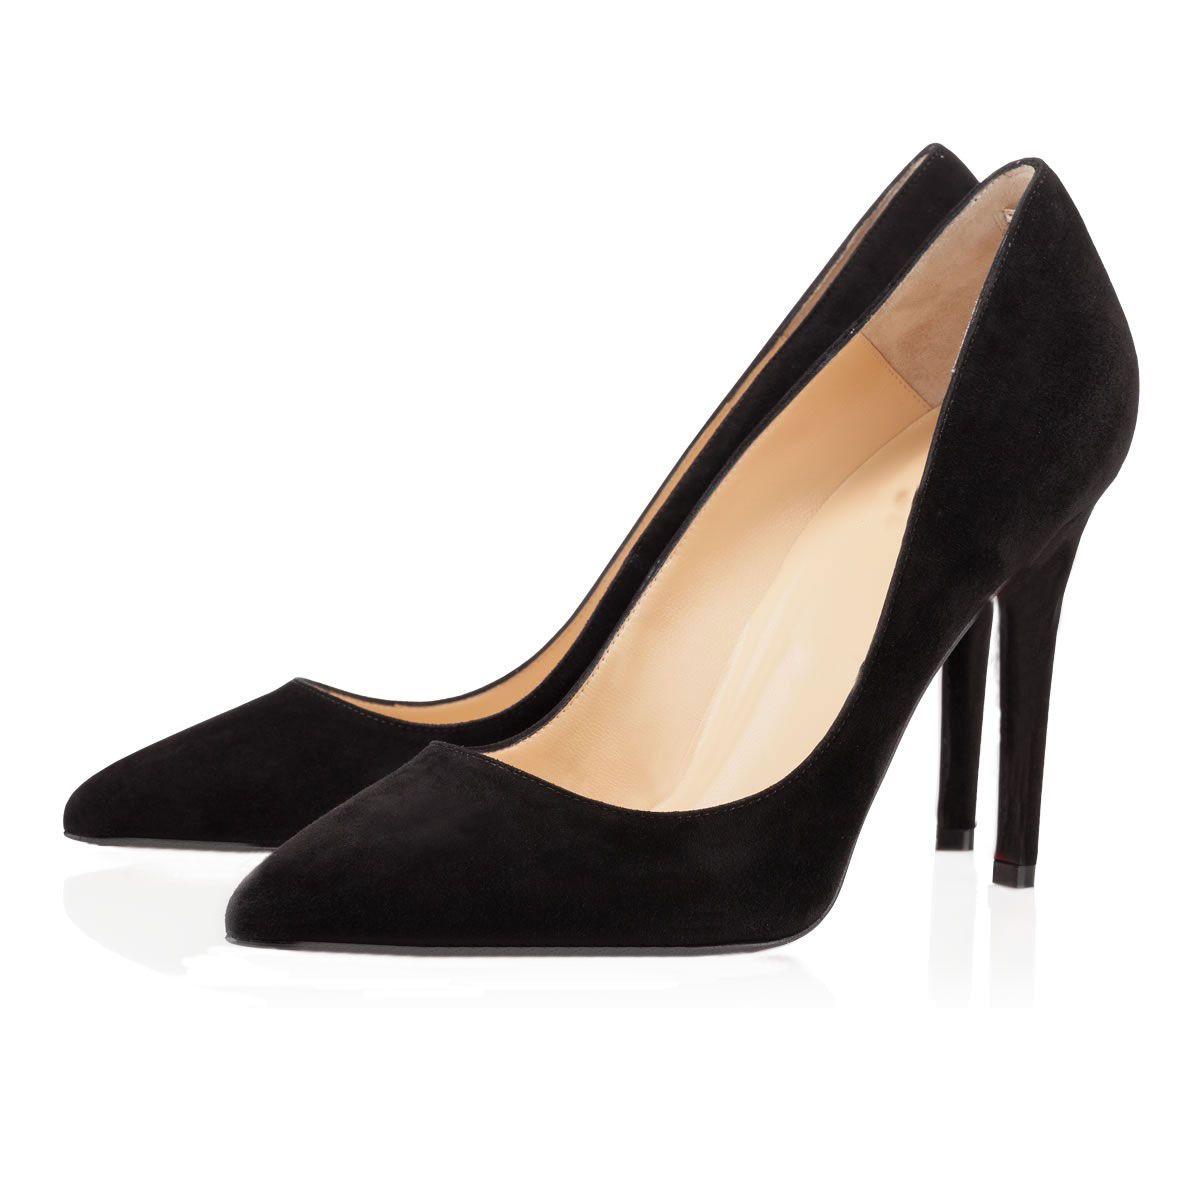 Fondos rojos 2021 mujeres 8cm 10 cm 12 cm tacones altos moda desnuda negro pink stilettos para femenino fiesta boda puntas puntas bombas zapatos de vestir